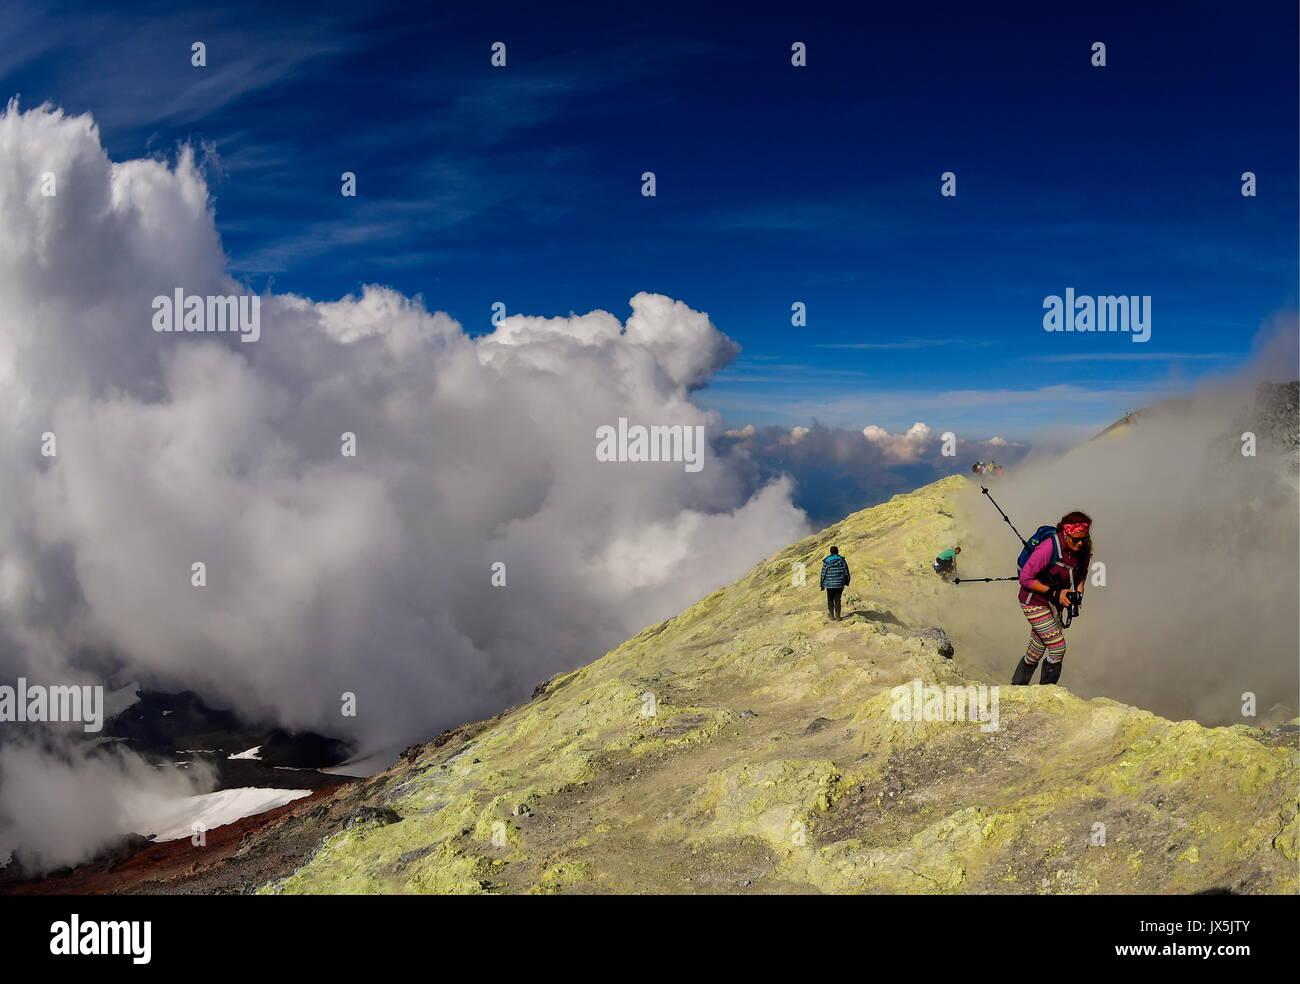 Kamtschatka, Russland. 12 Aug, 2017. Touristen am Krater des Avachinsky aktiver stratovulkan. Credit: Yuri Smityuk/TASS/Alamy Stockbild